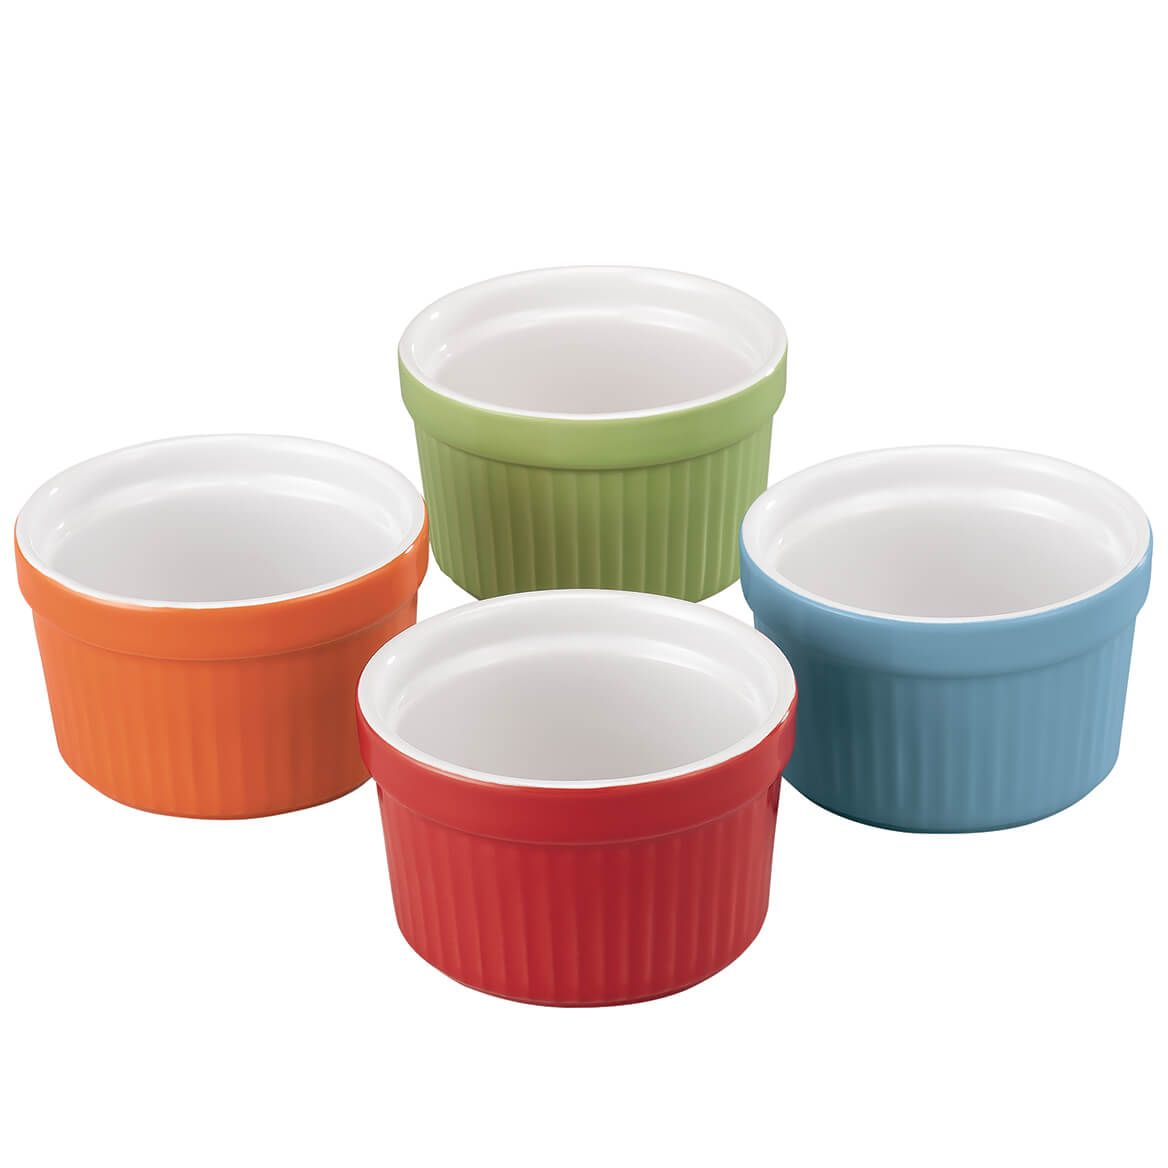 Porcelain Ramekins Set of 4 Assorted Colors by HMP-369476